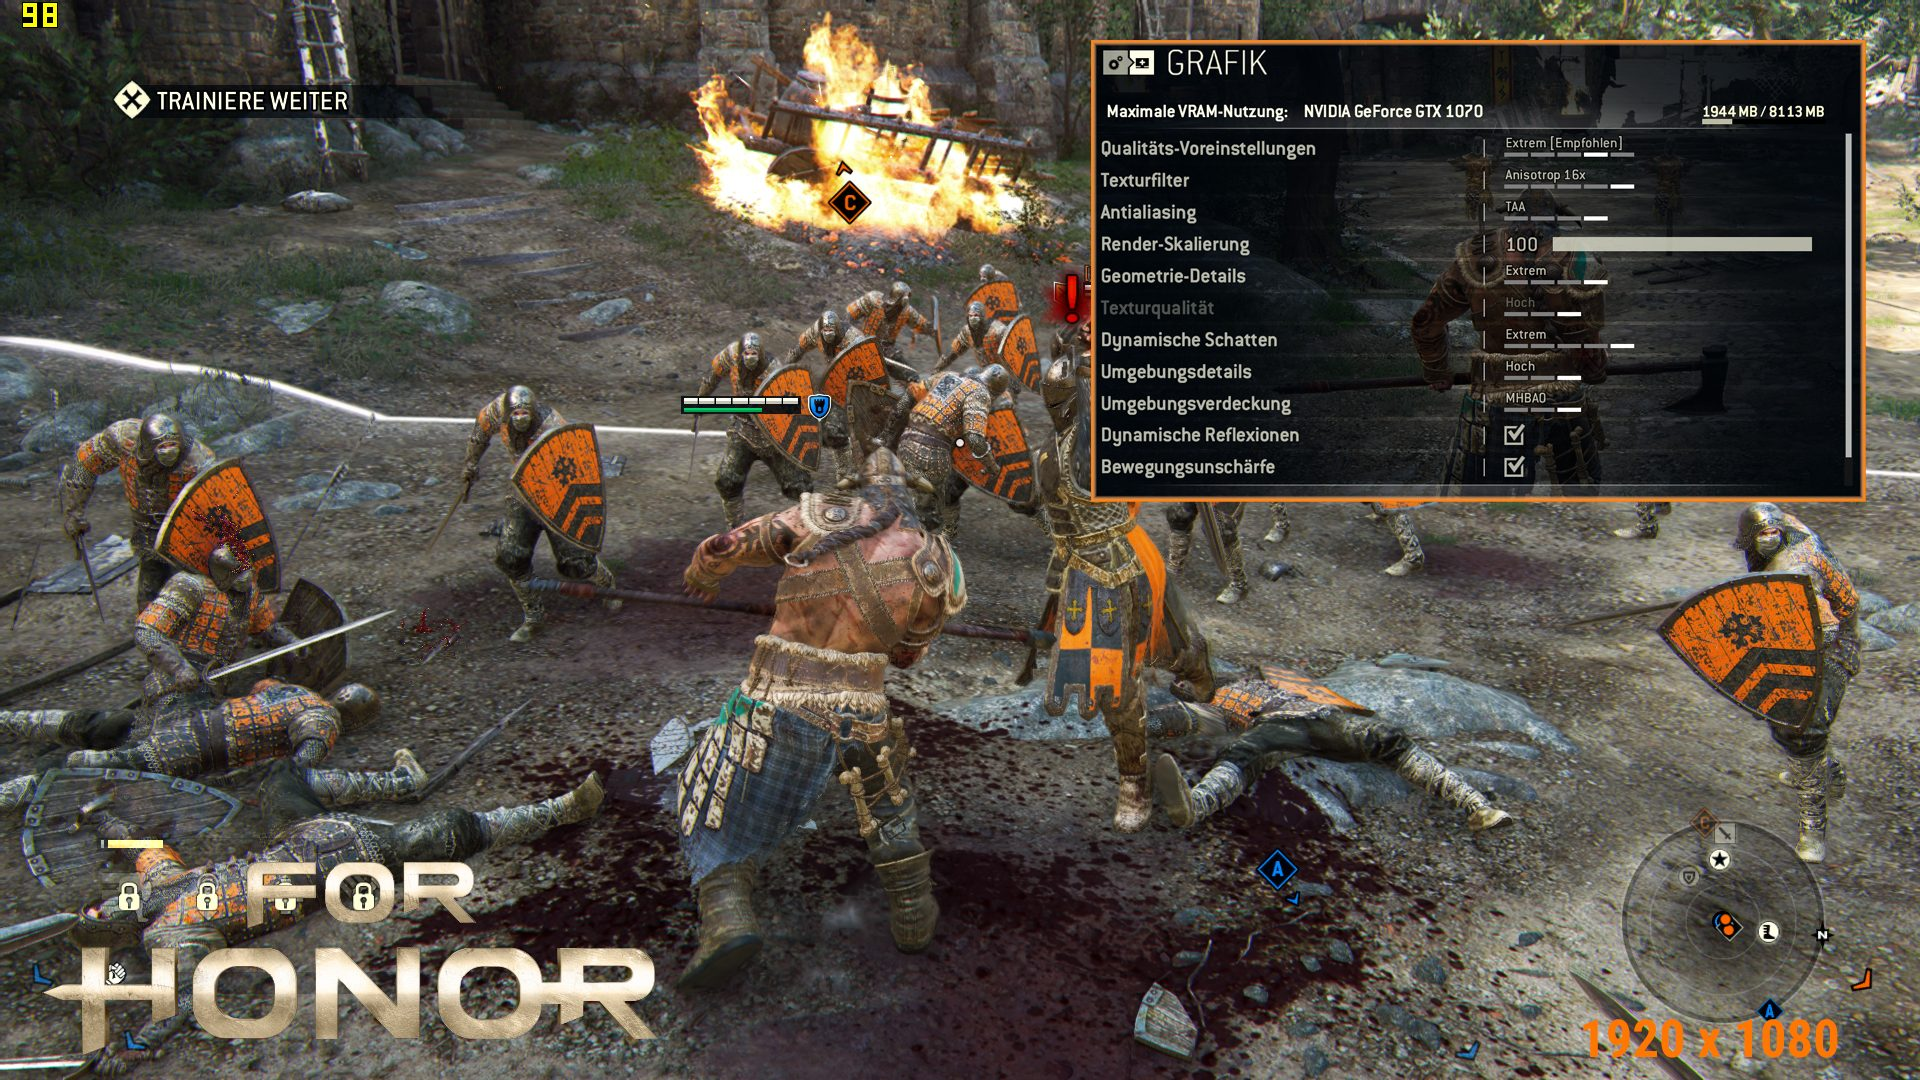 Acer-Predator-17-G9-793-79NC-Grafik_19